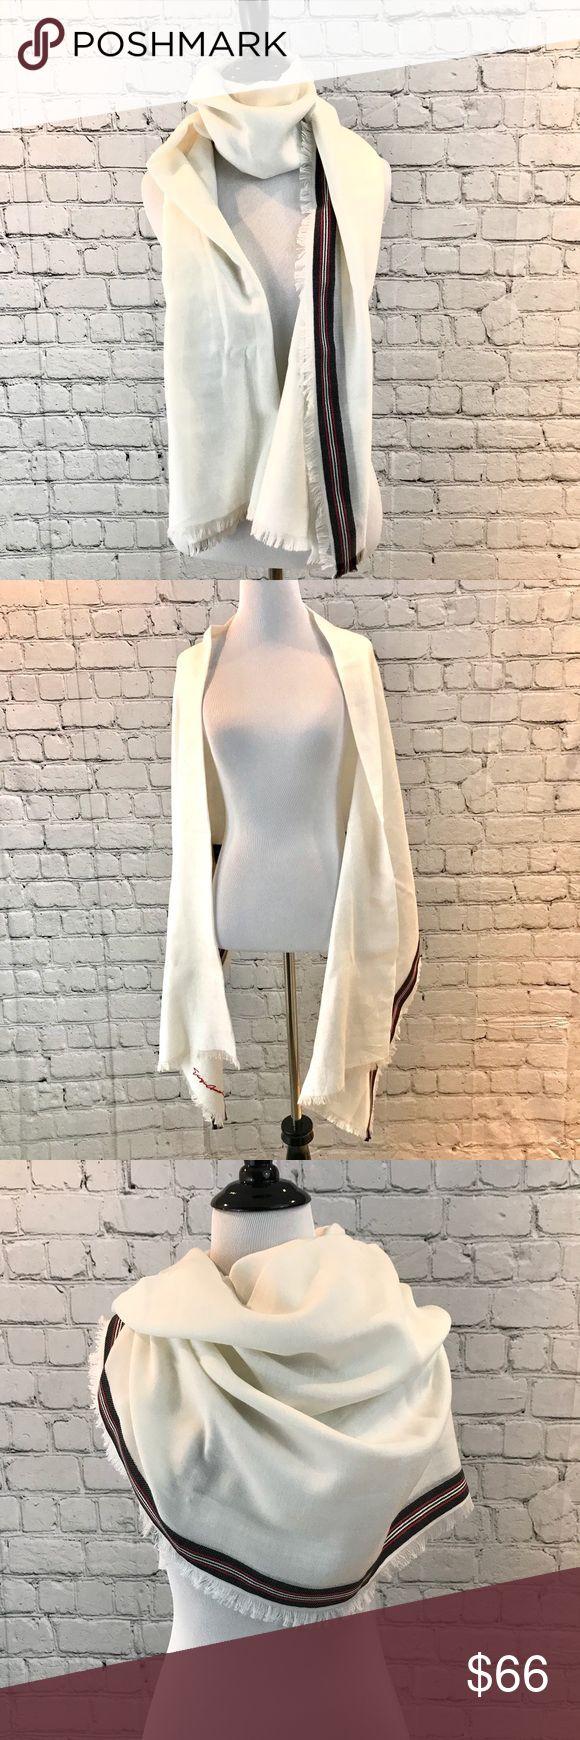 Giorgio Armani White Winter Scarf Excellent condition!! Like new. Cotton silk wool blend. White with a red and black stripe. Giorgio Armani Accessories Scarves & Wraps